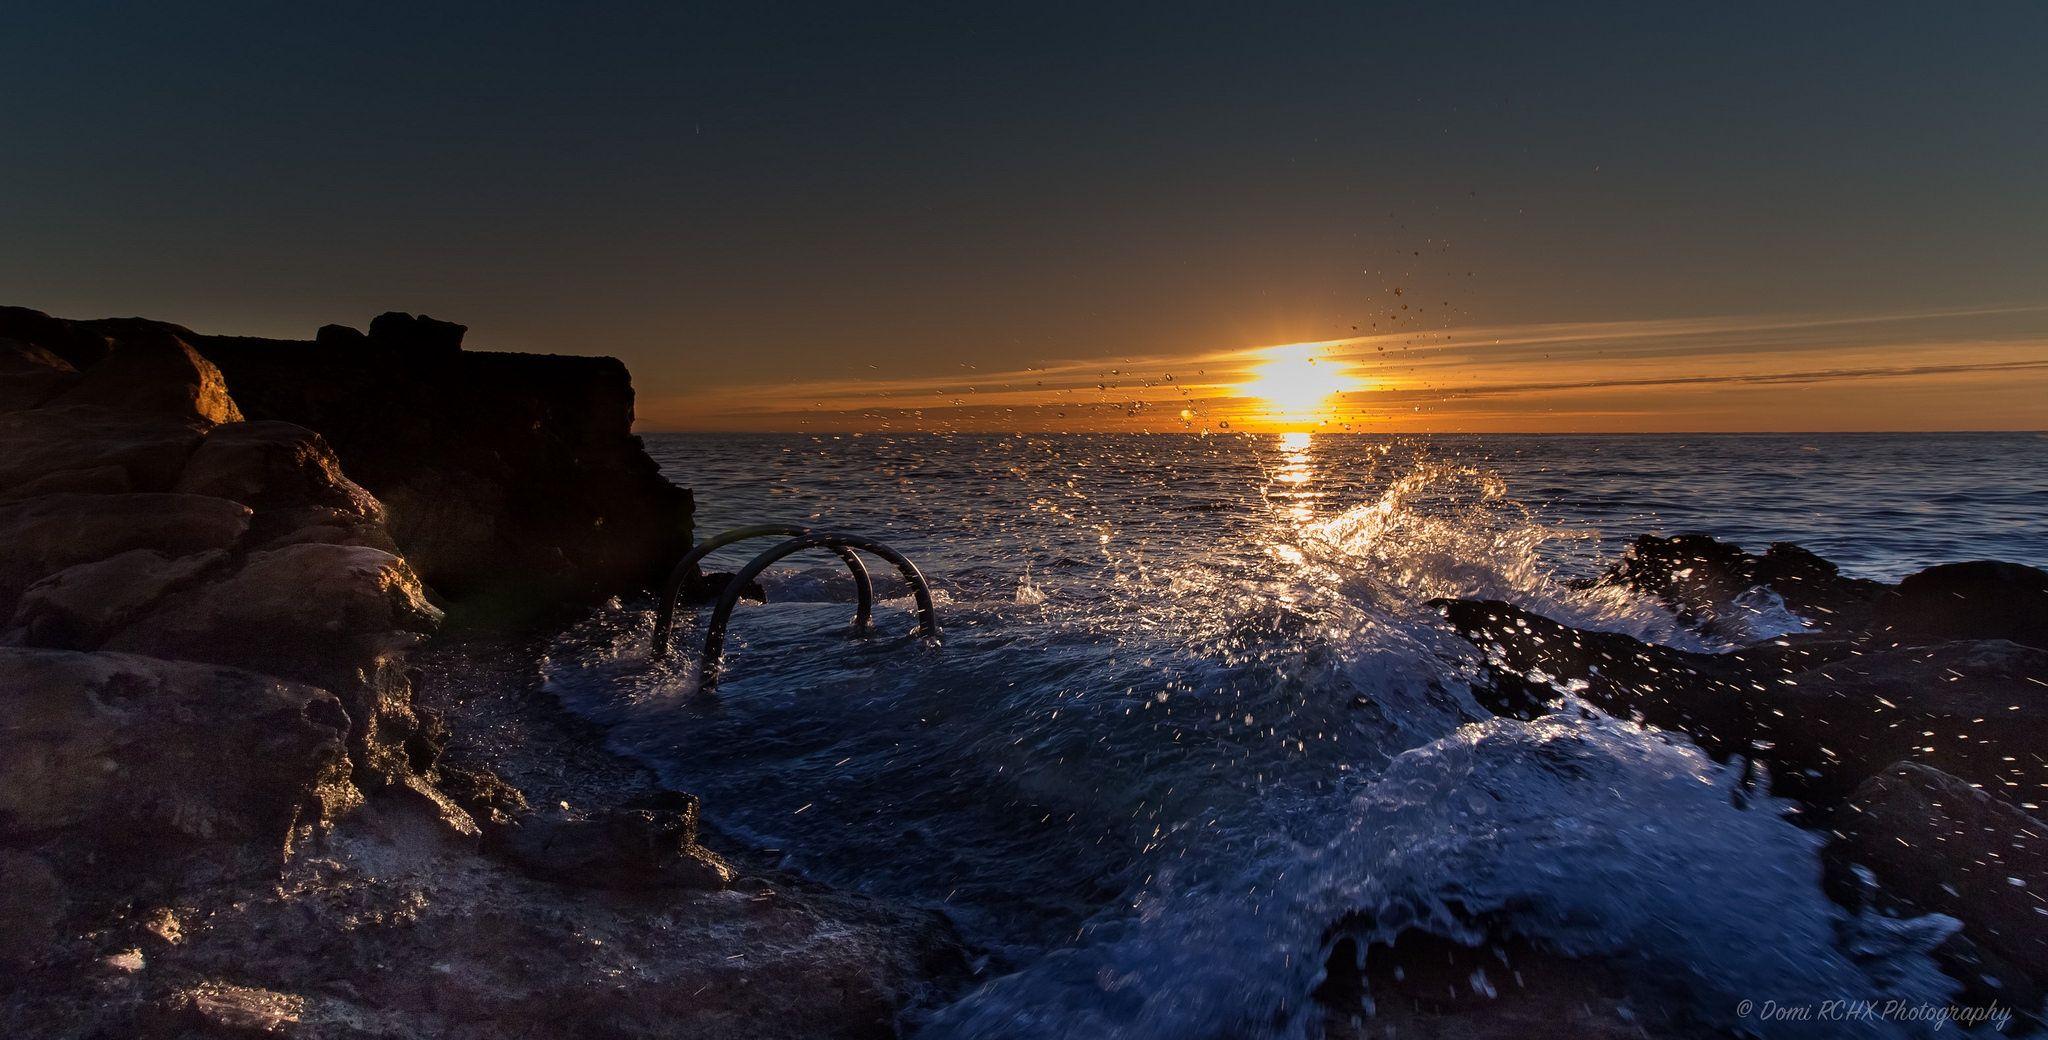 https://flic.kr/p/yMdA8z | Sunrise over Sea, city of Antibes Juan Les Pins, French Riviera by Domi RCHX Photography | Lever du soleil sur la mer, ville d'Antibes Juan Les Pins, Côte d'Azur, FRANCE par Domi RCHX Photography